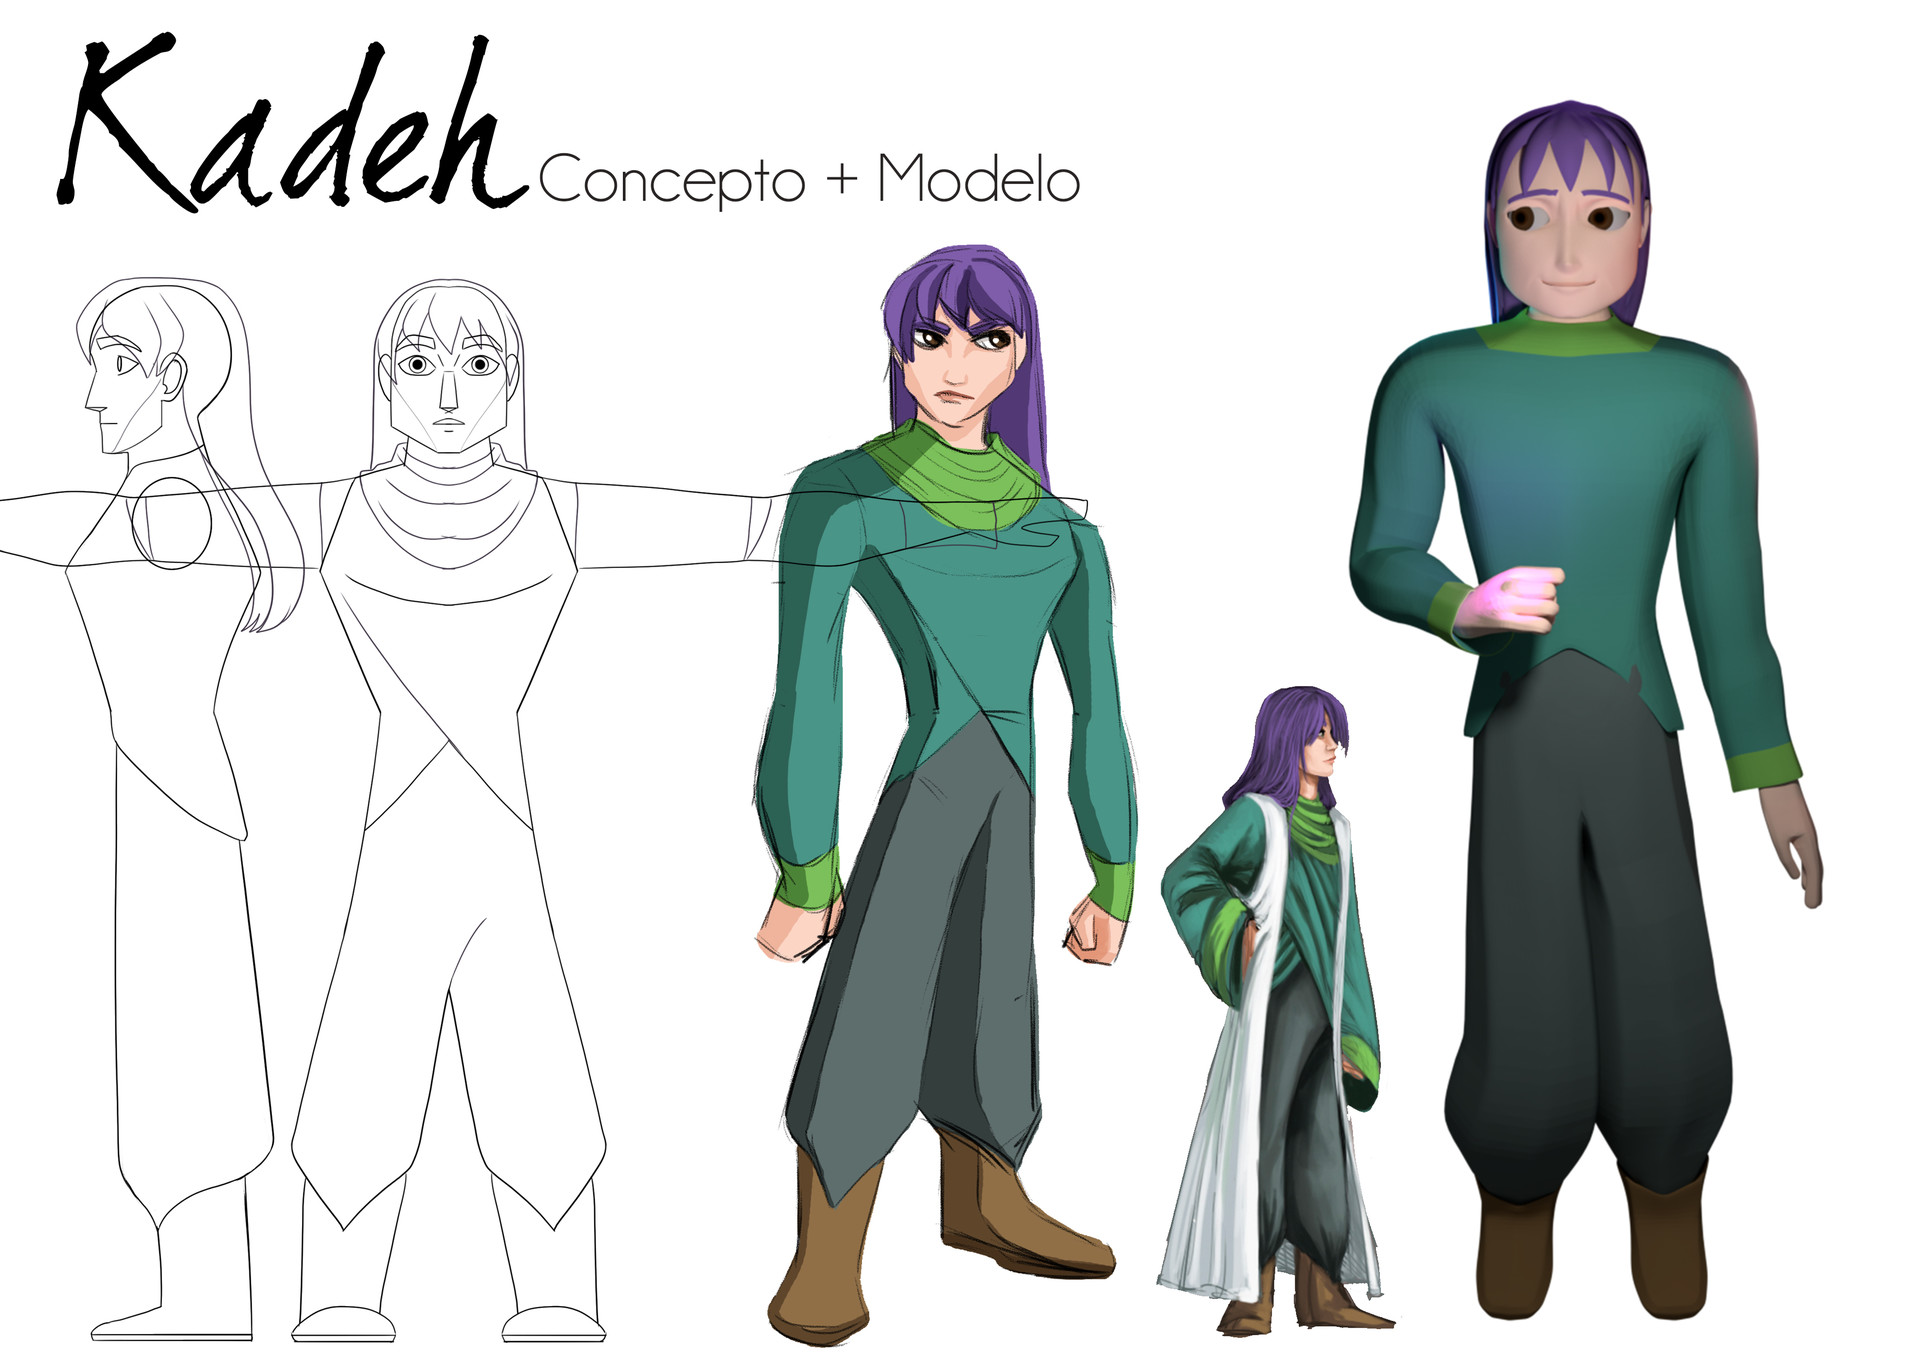 Elizabeth goldring kadeh modelo concept